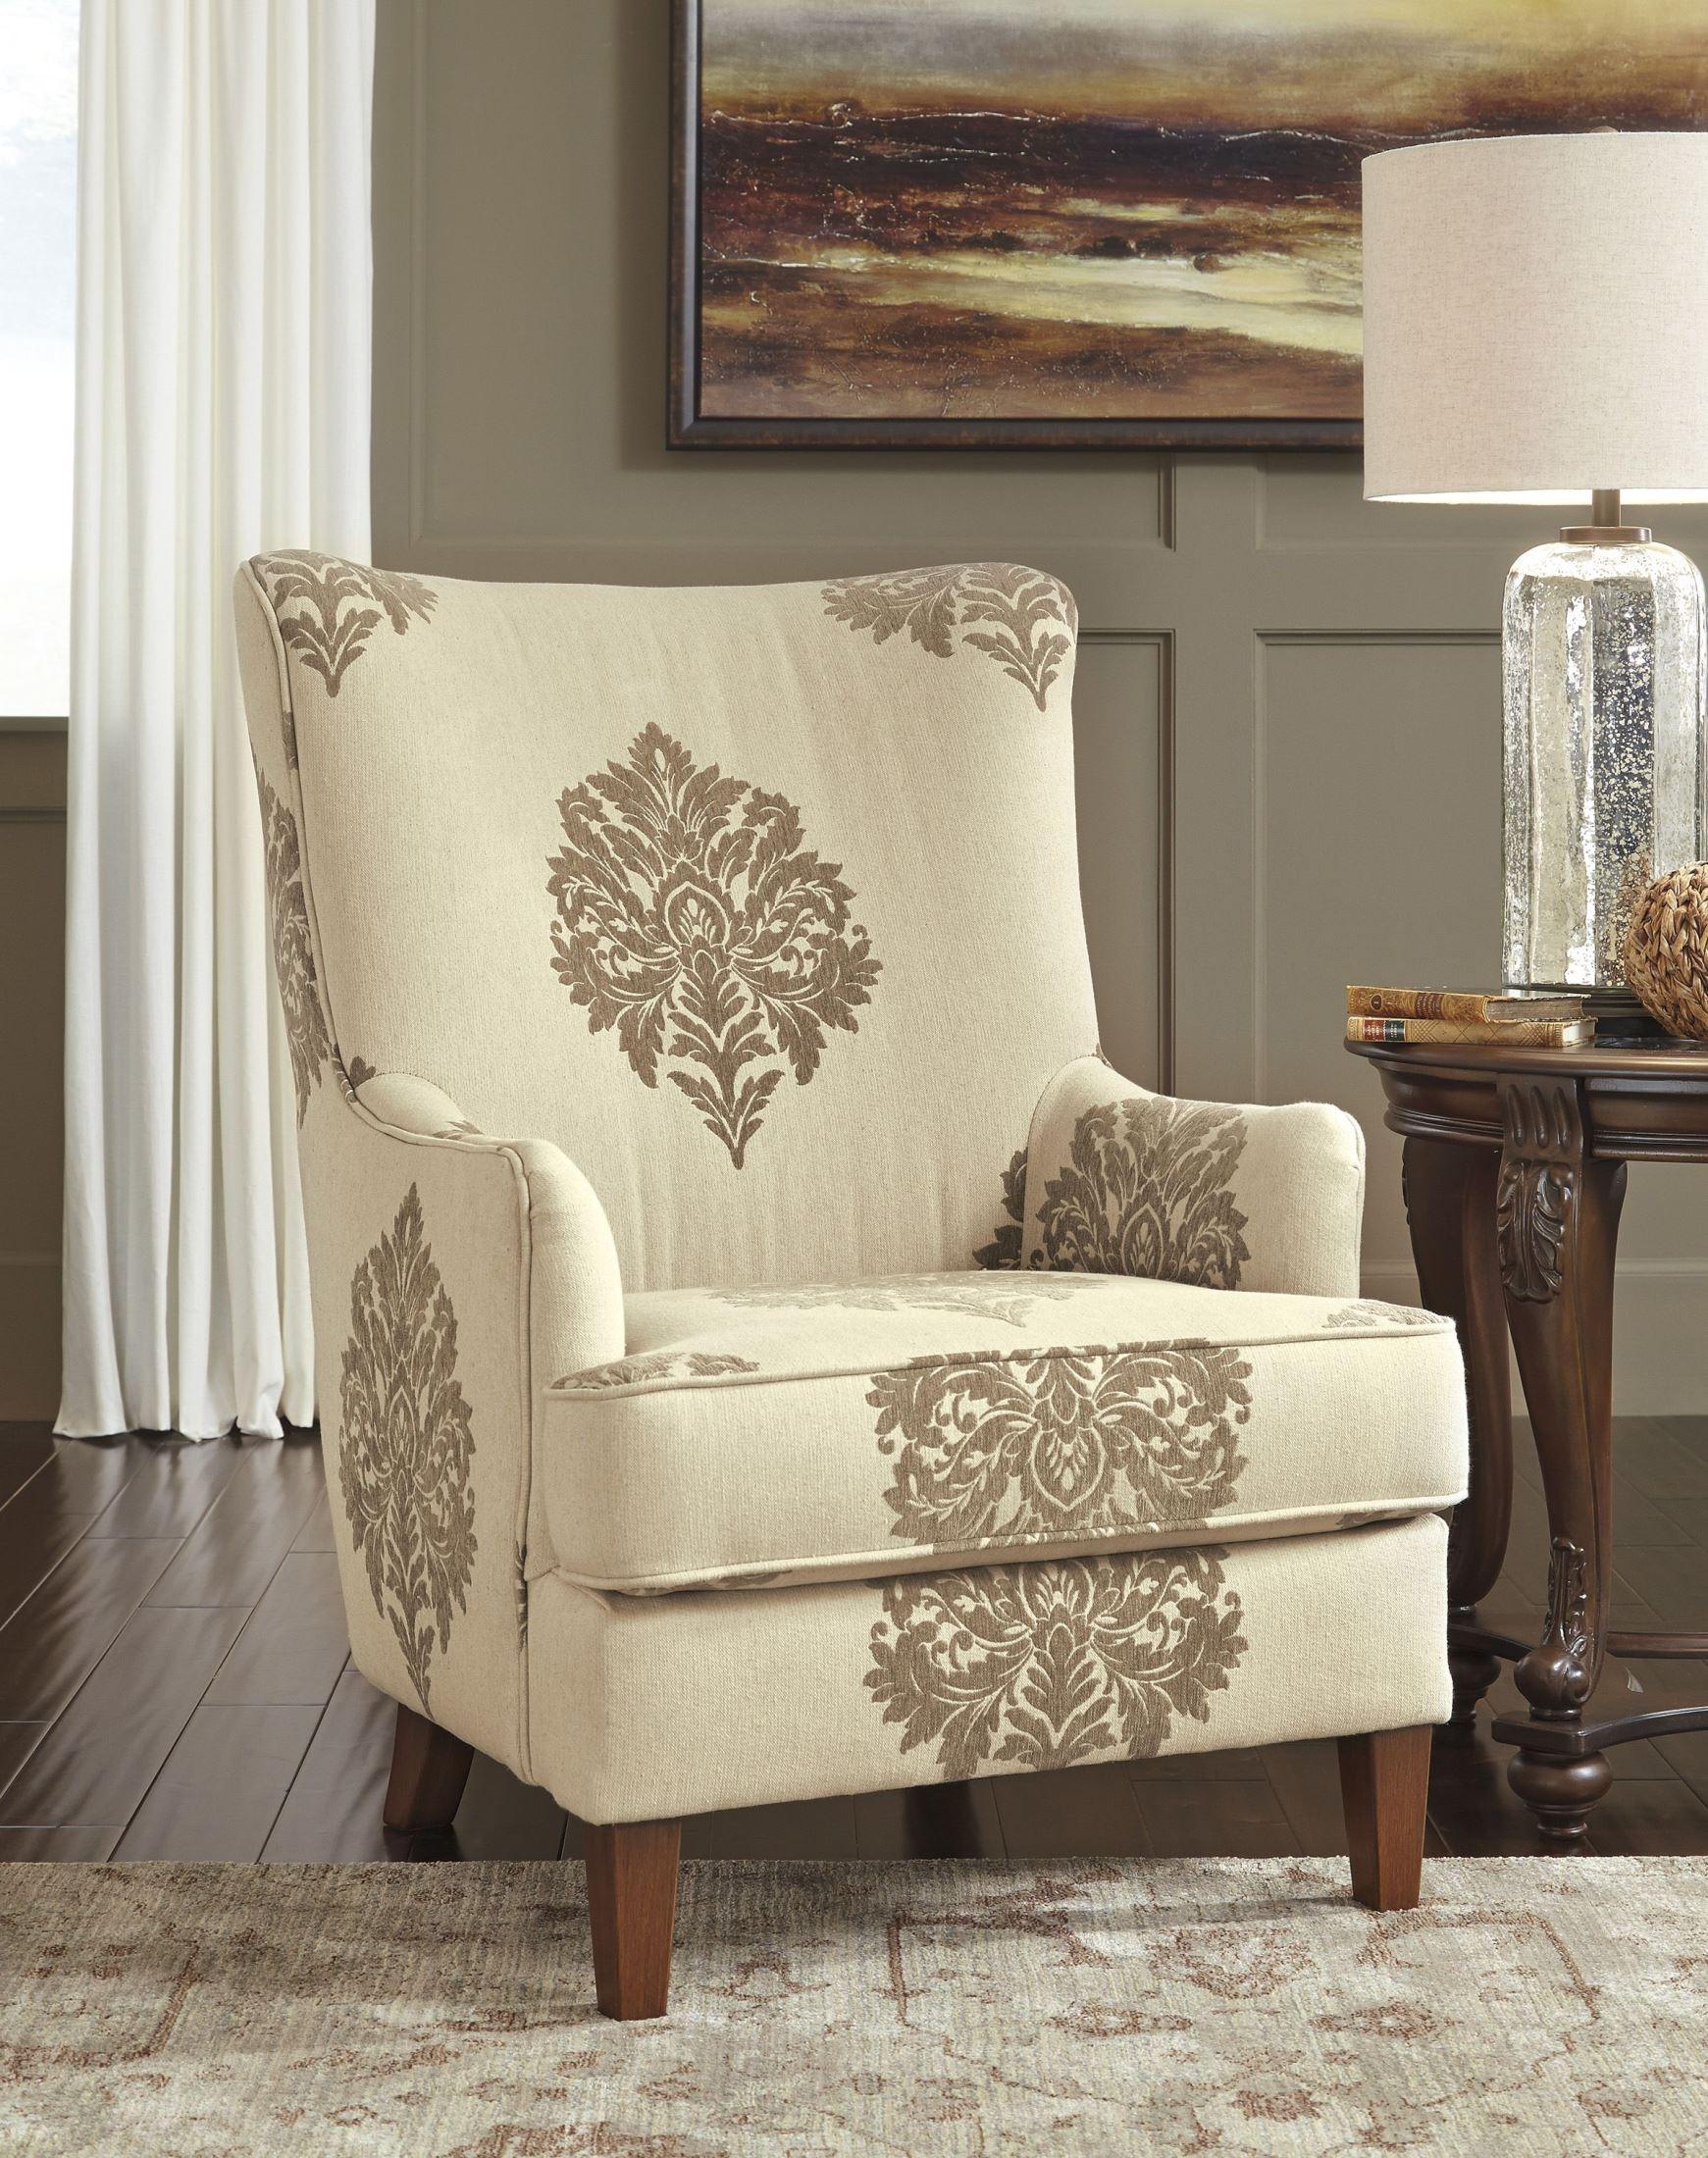 Berwyn View Quartz Accent Chair from Ashley 898XX21